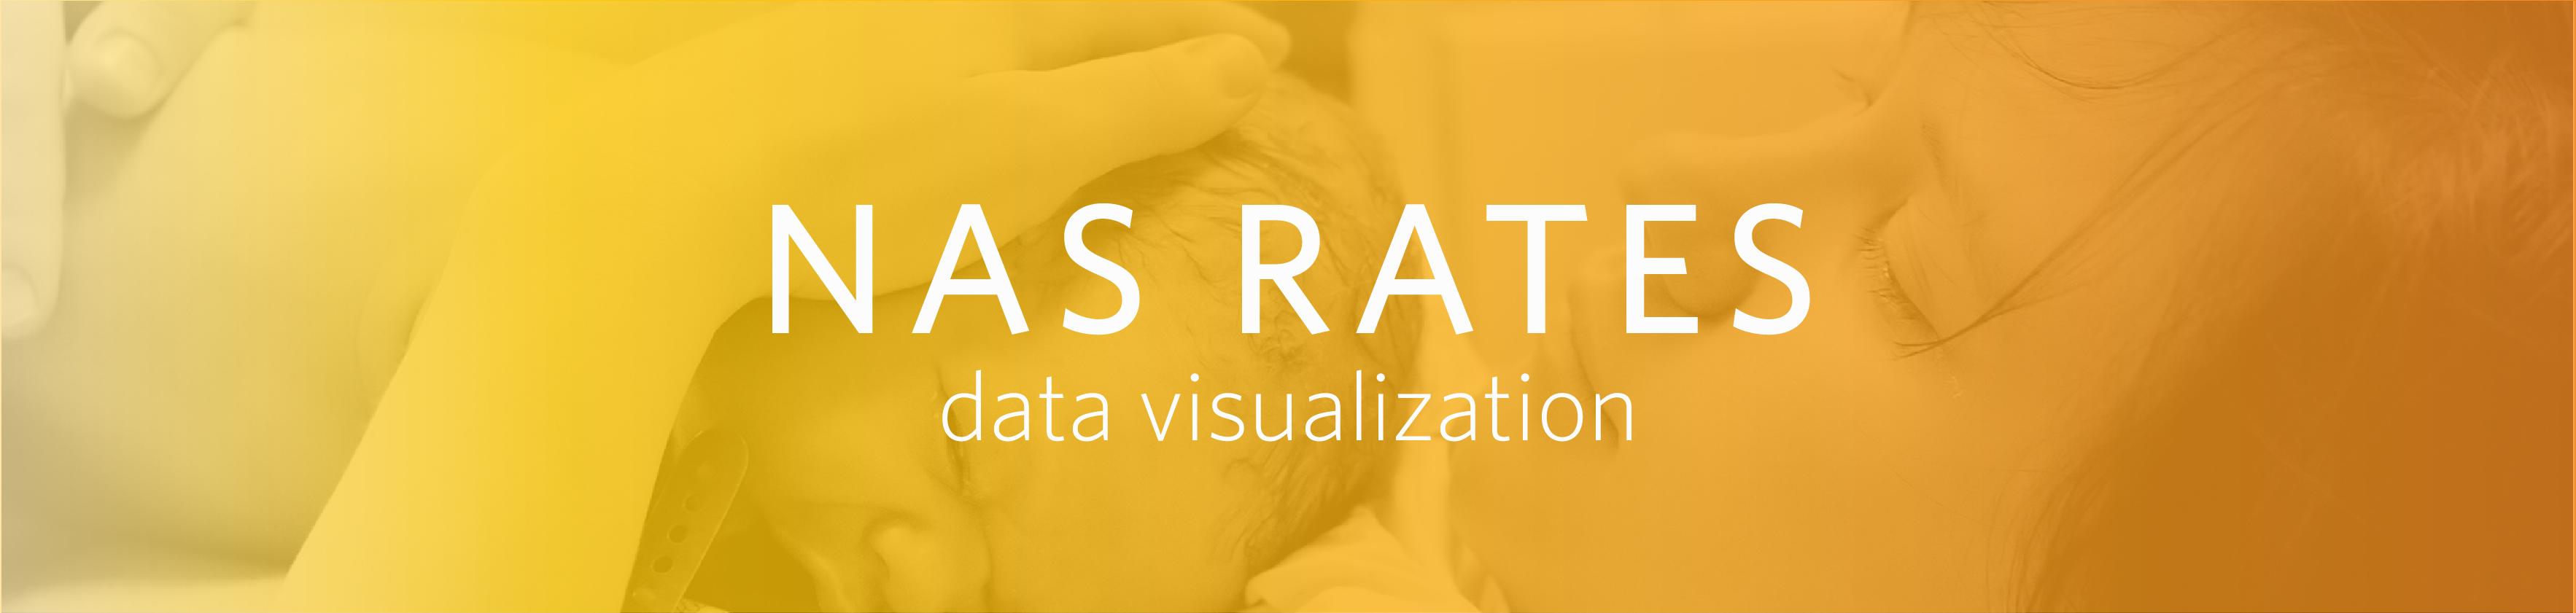 data viz - nas rates